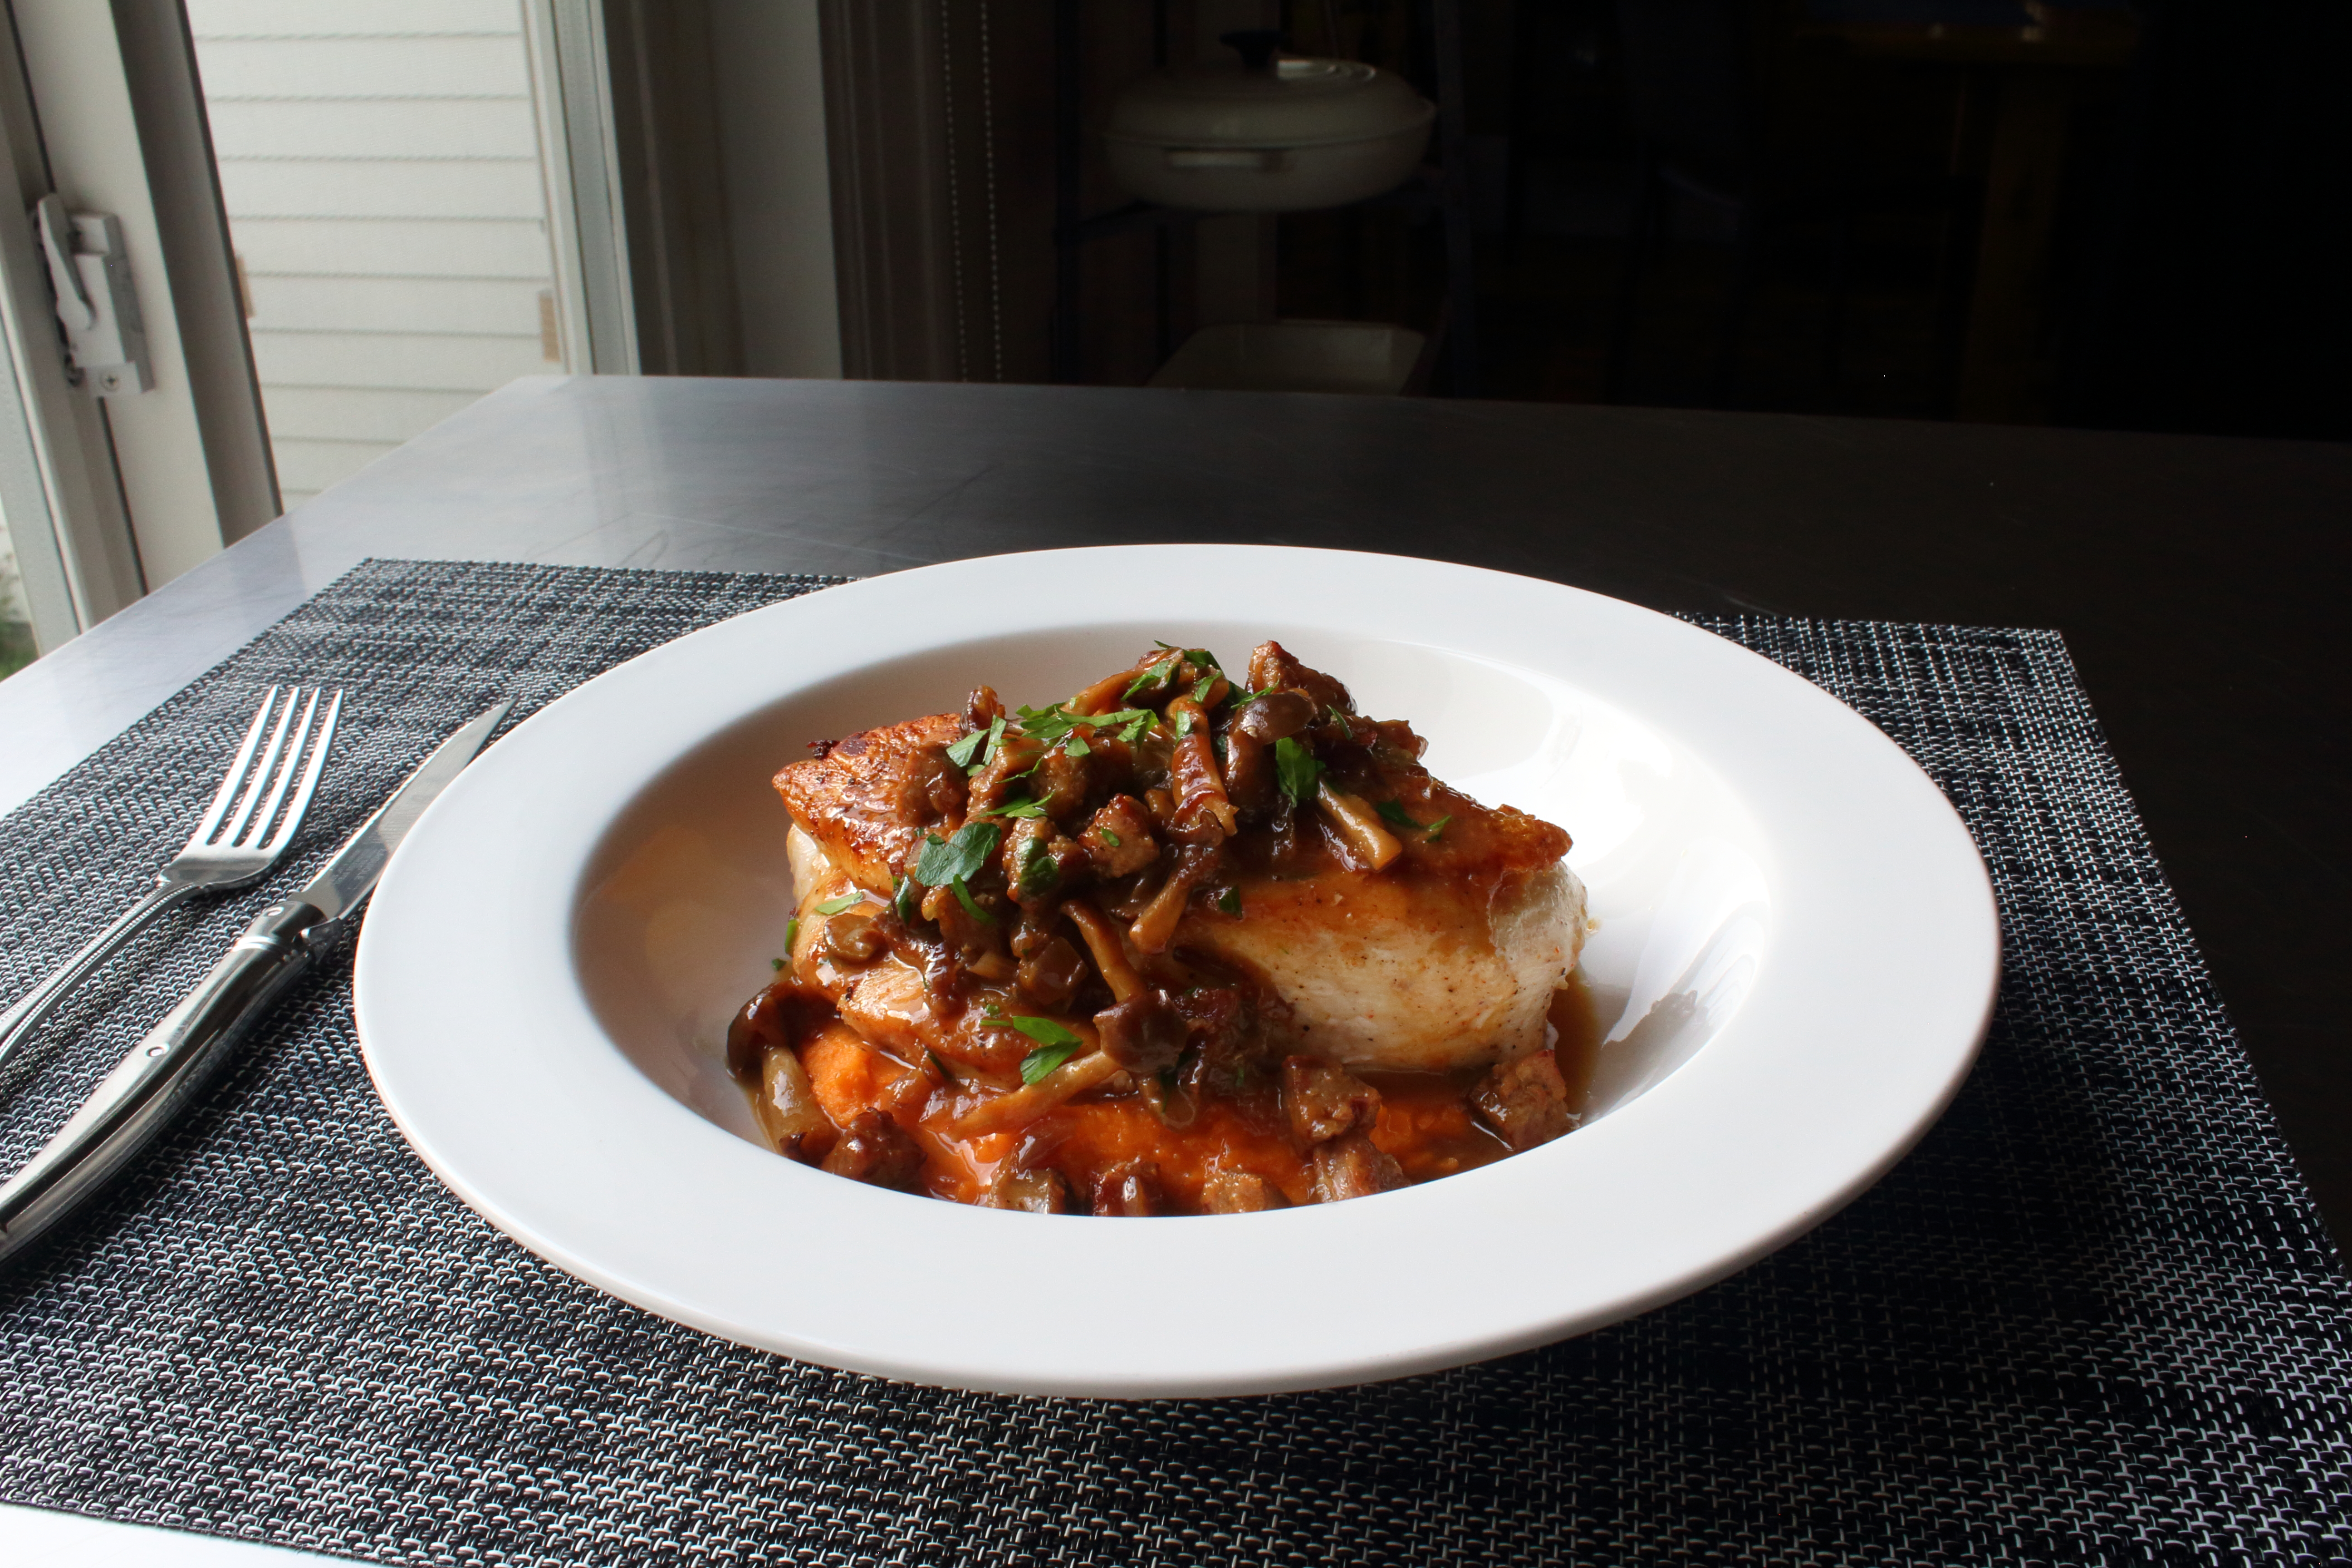 Sausage-Mushroom Chicken Chef John